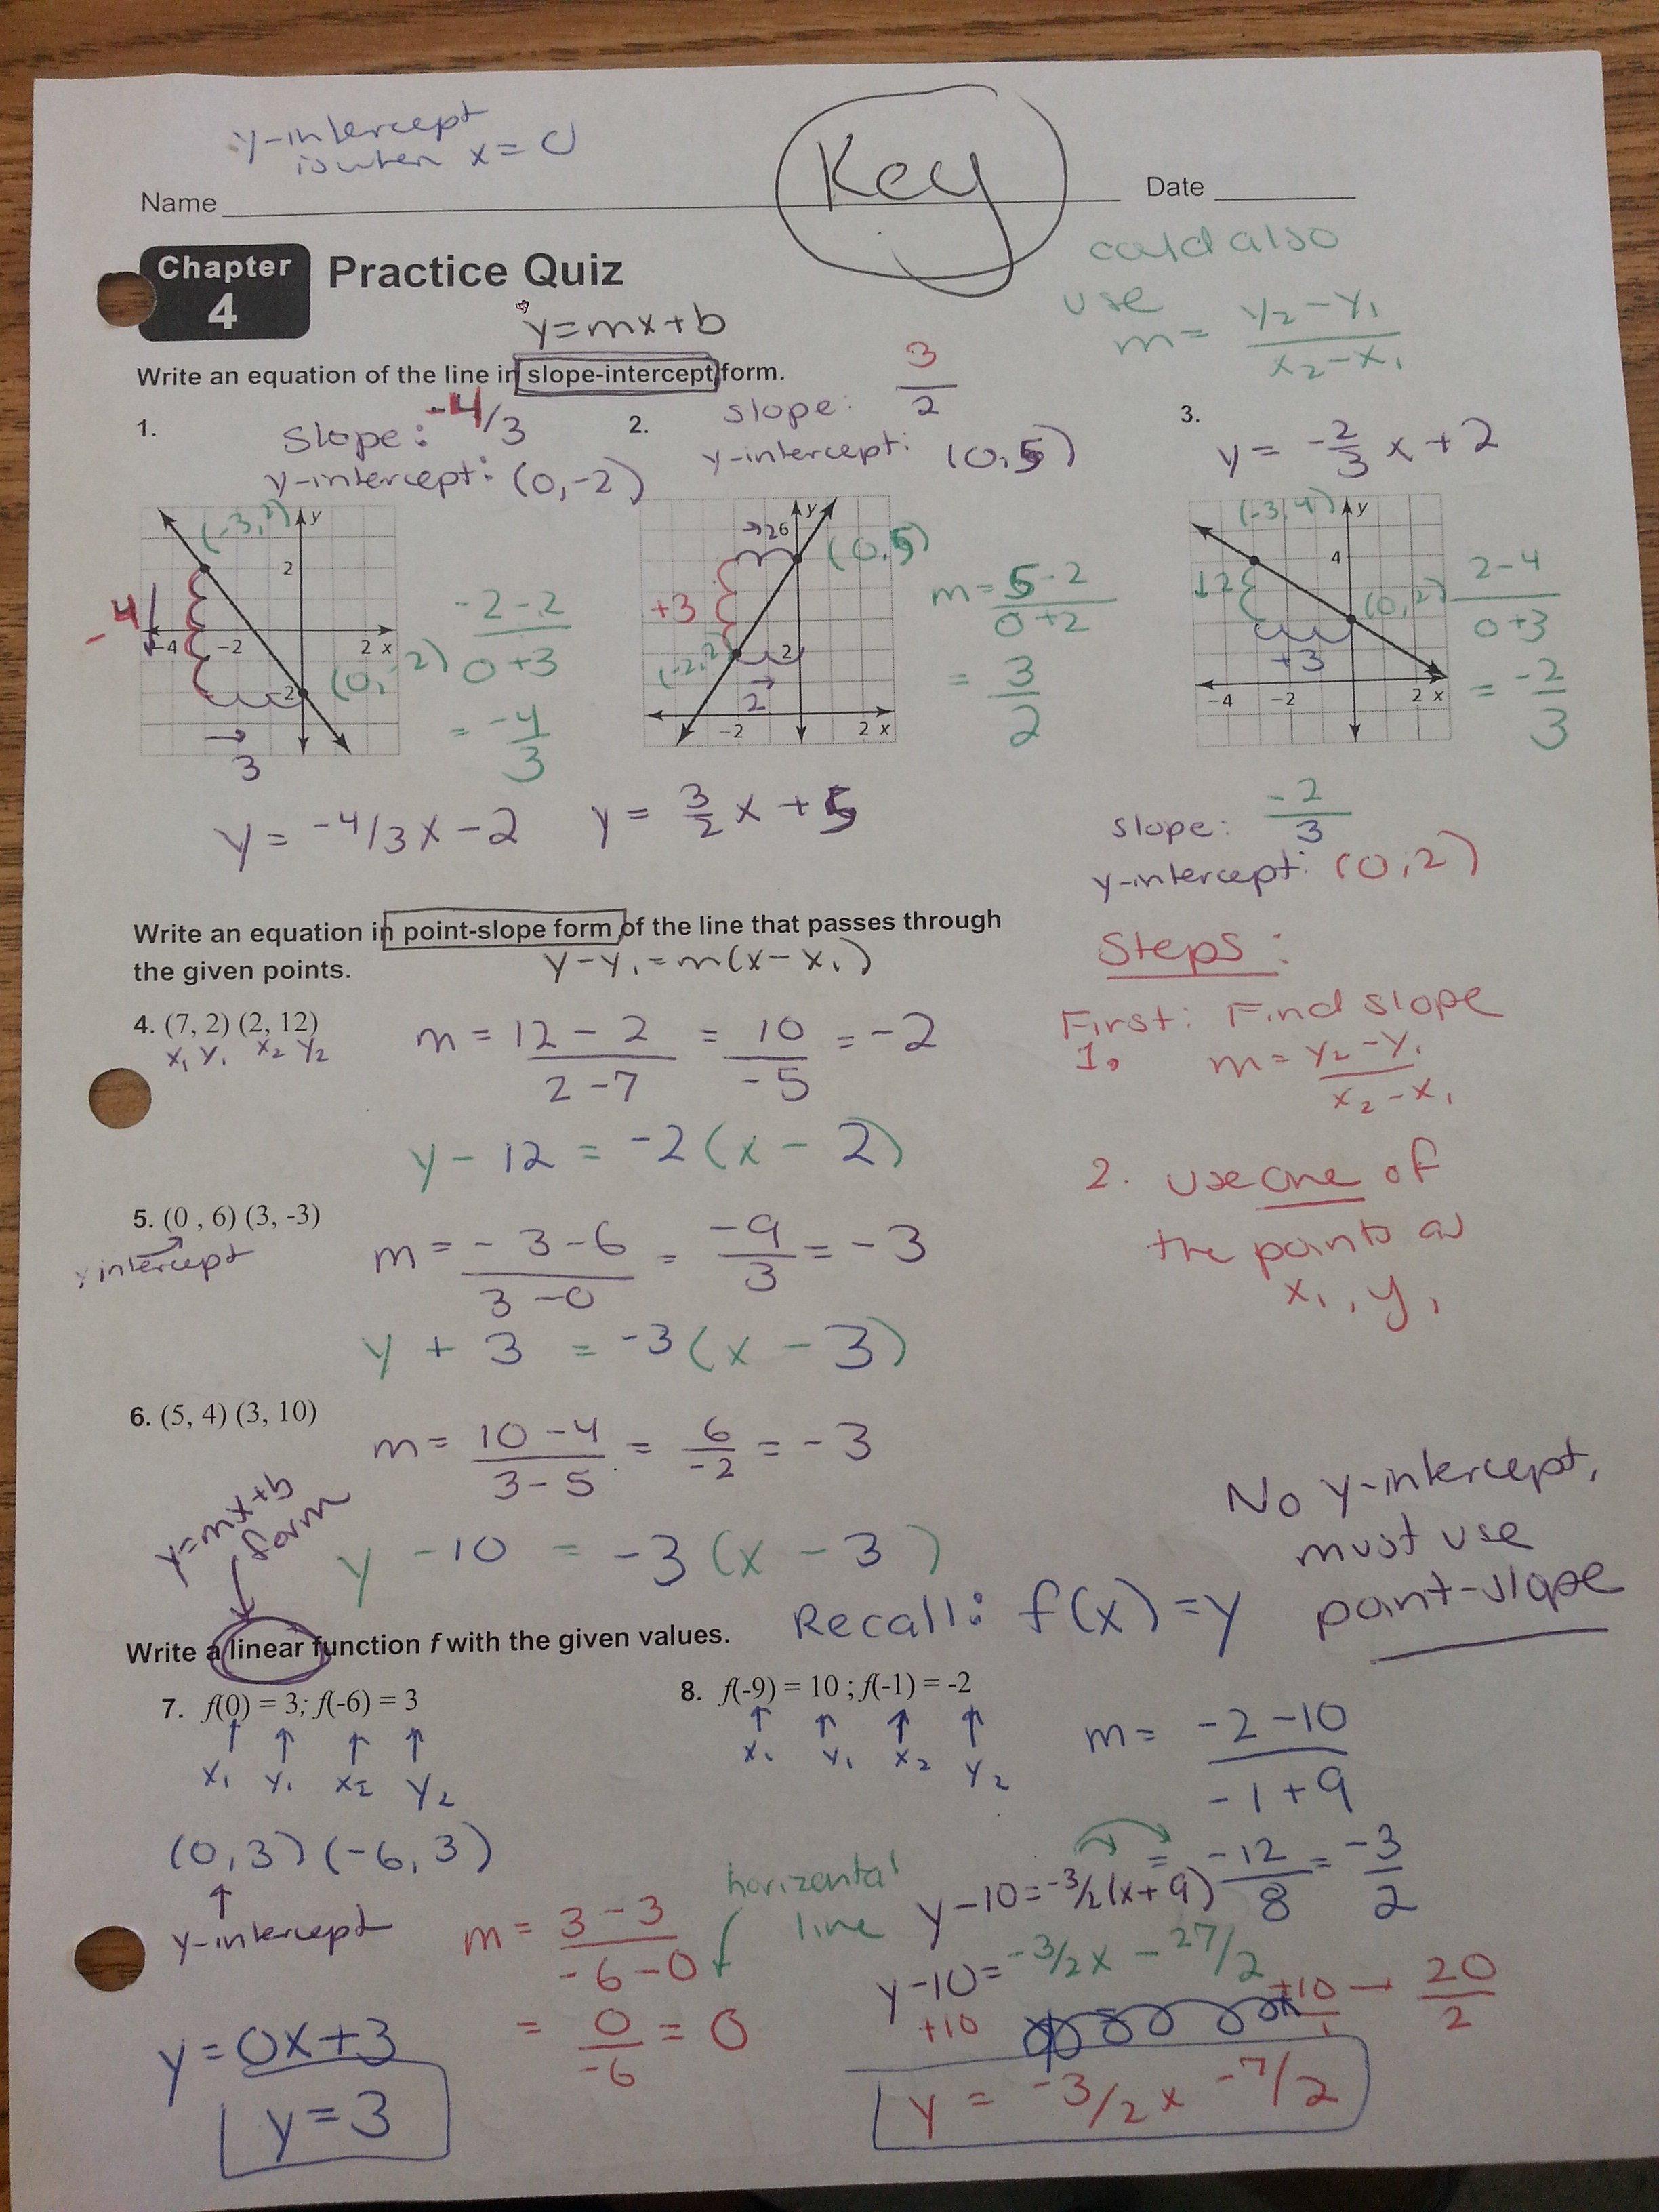 10 Stunning Big Ideas Math Red Book kindergarten arroyo grande high school big ideas math worksheets